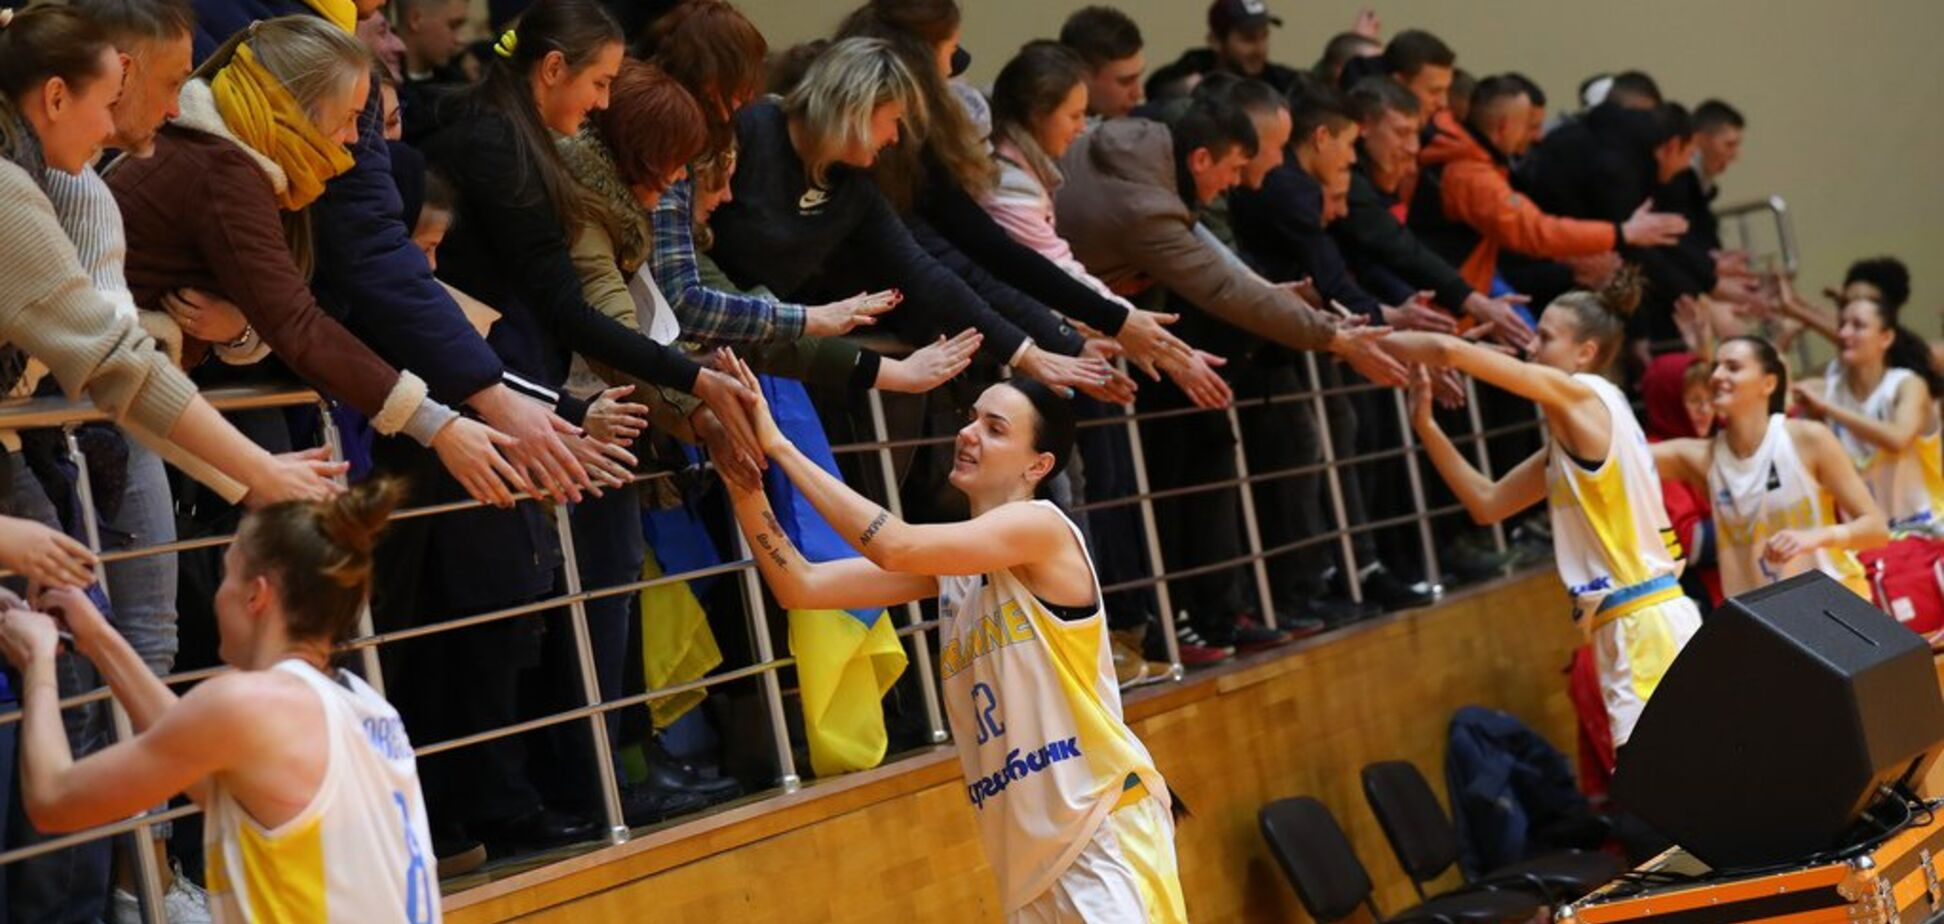 Украинки произвели фурор в Харькове после матча Евробаскета